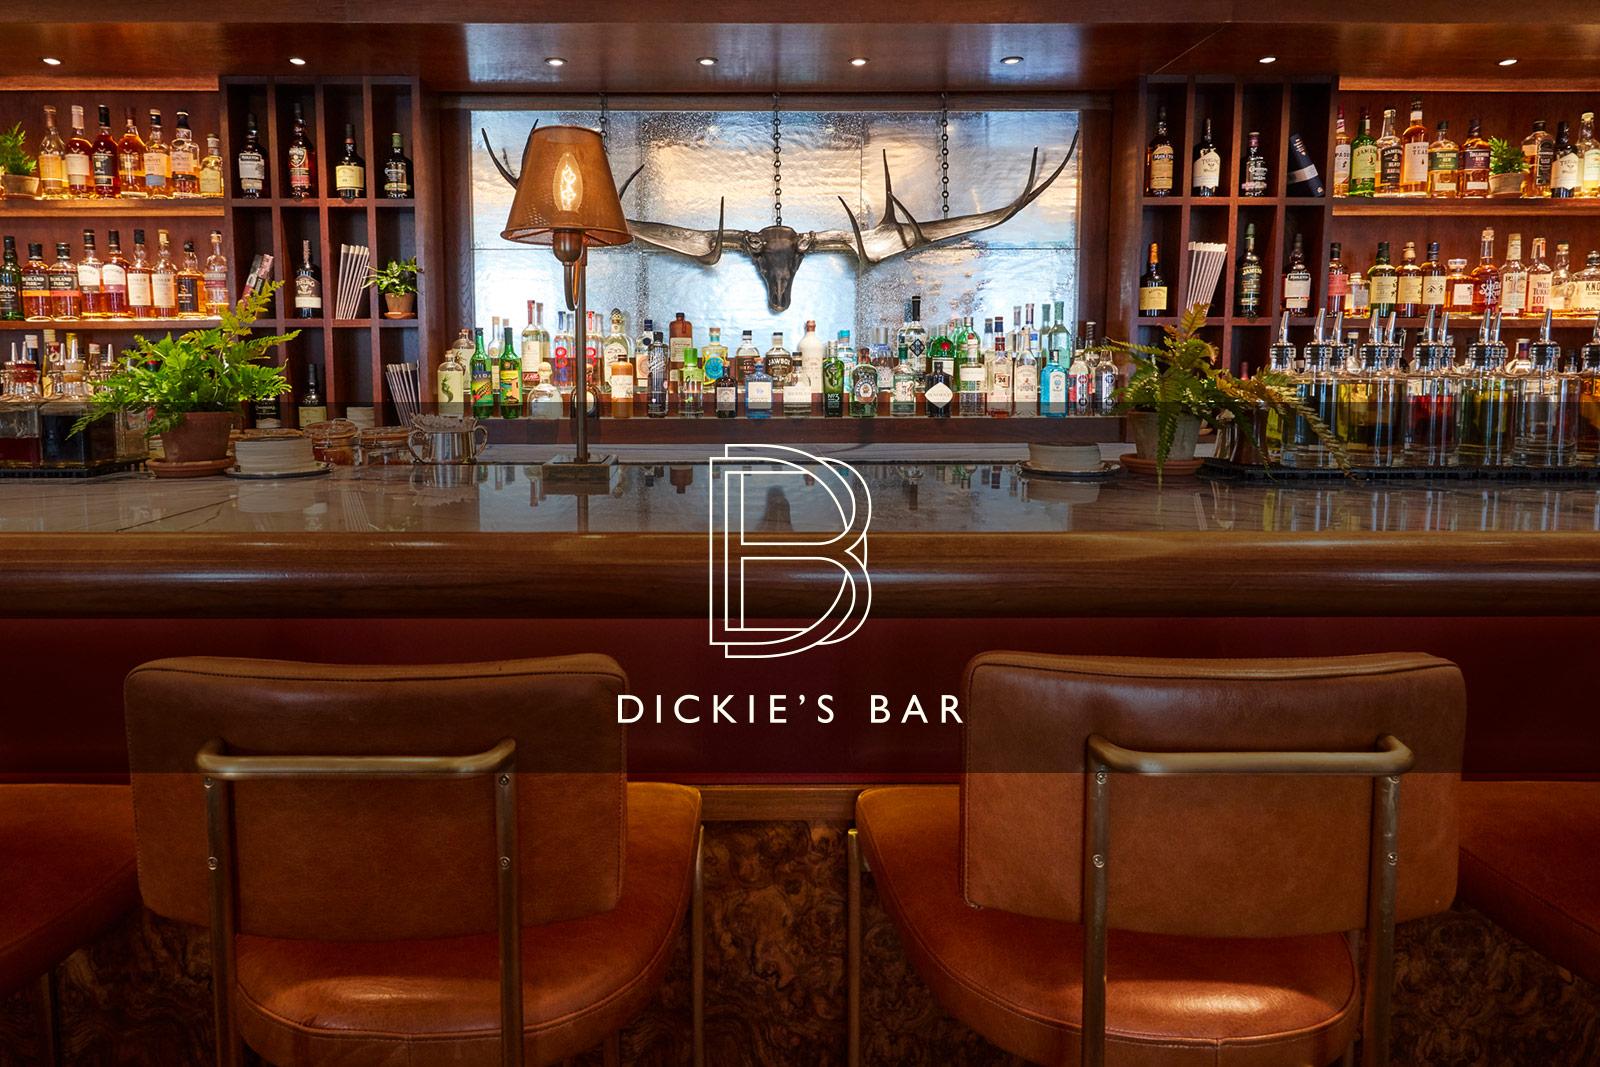 Dickie's Bar